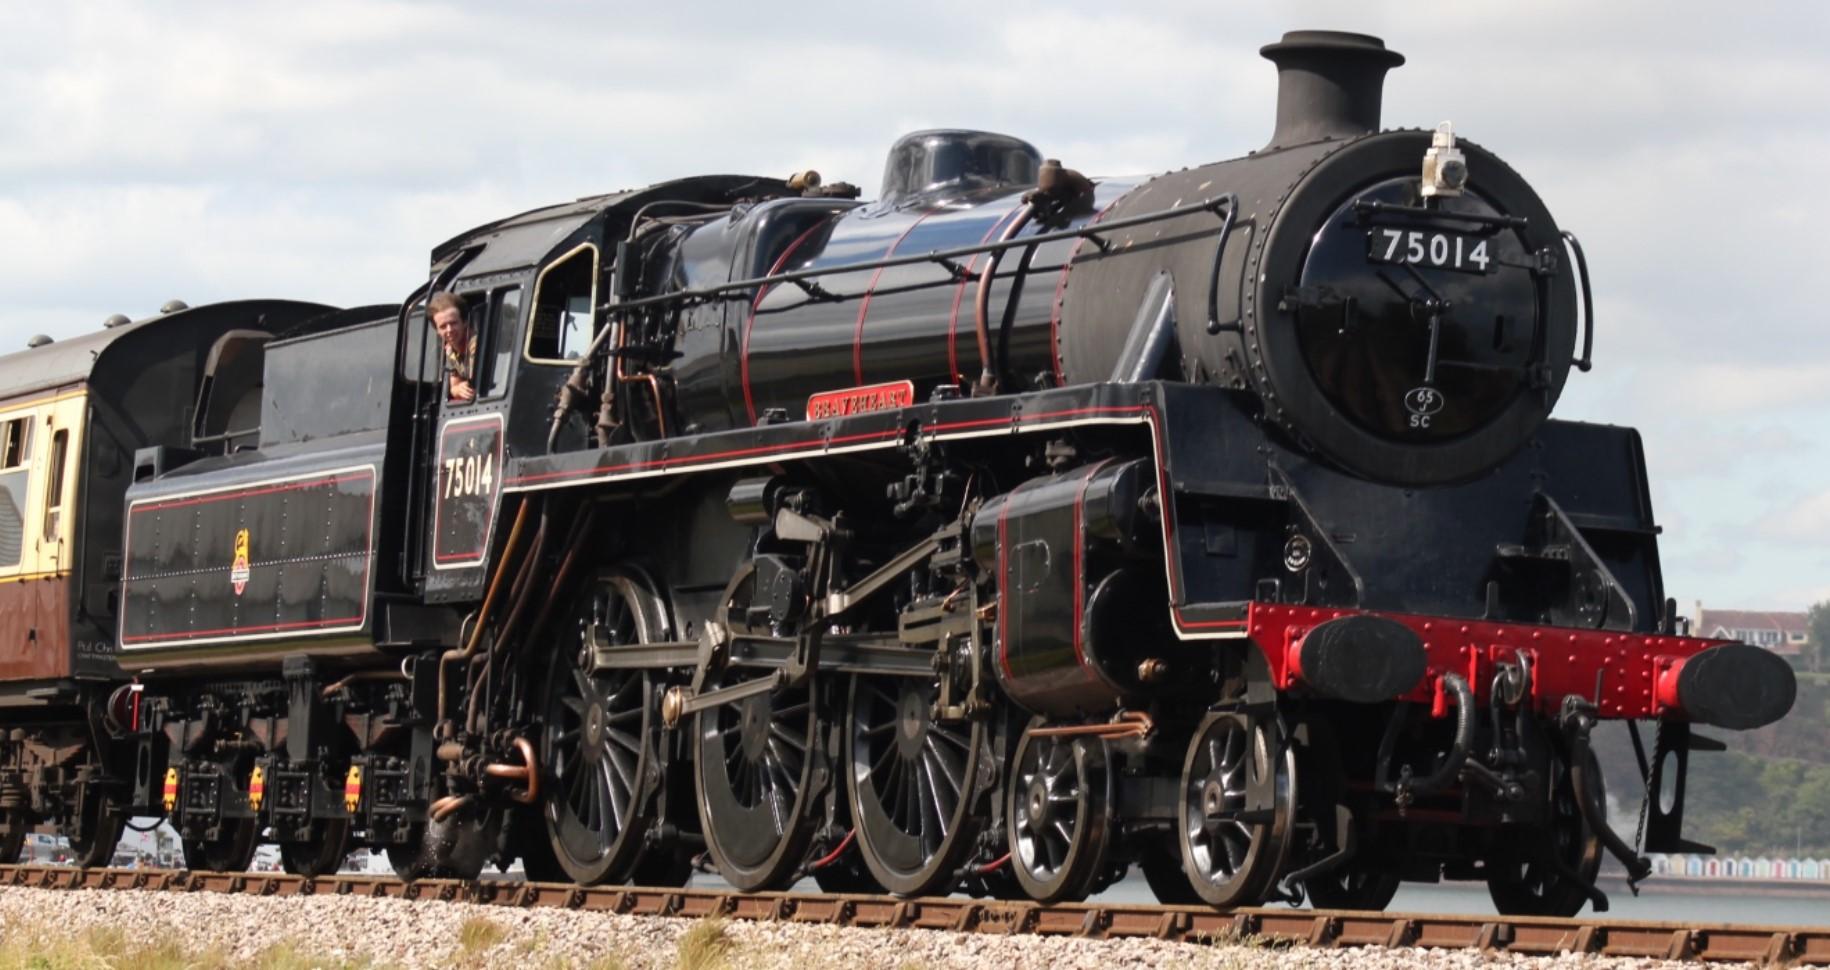 75014 'Braveheart' at Goodrington on the Dartmouth Steam Railway in June 2019. ©Geof Sheppard